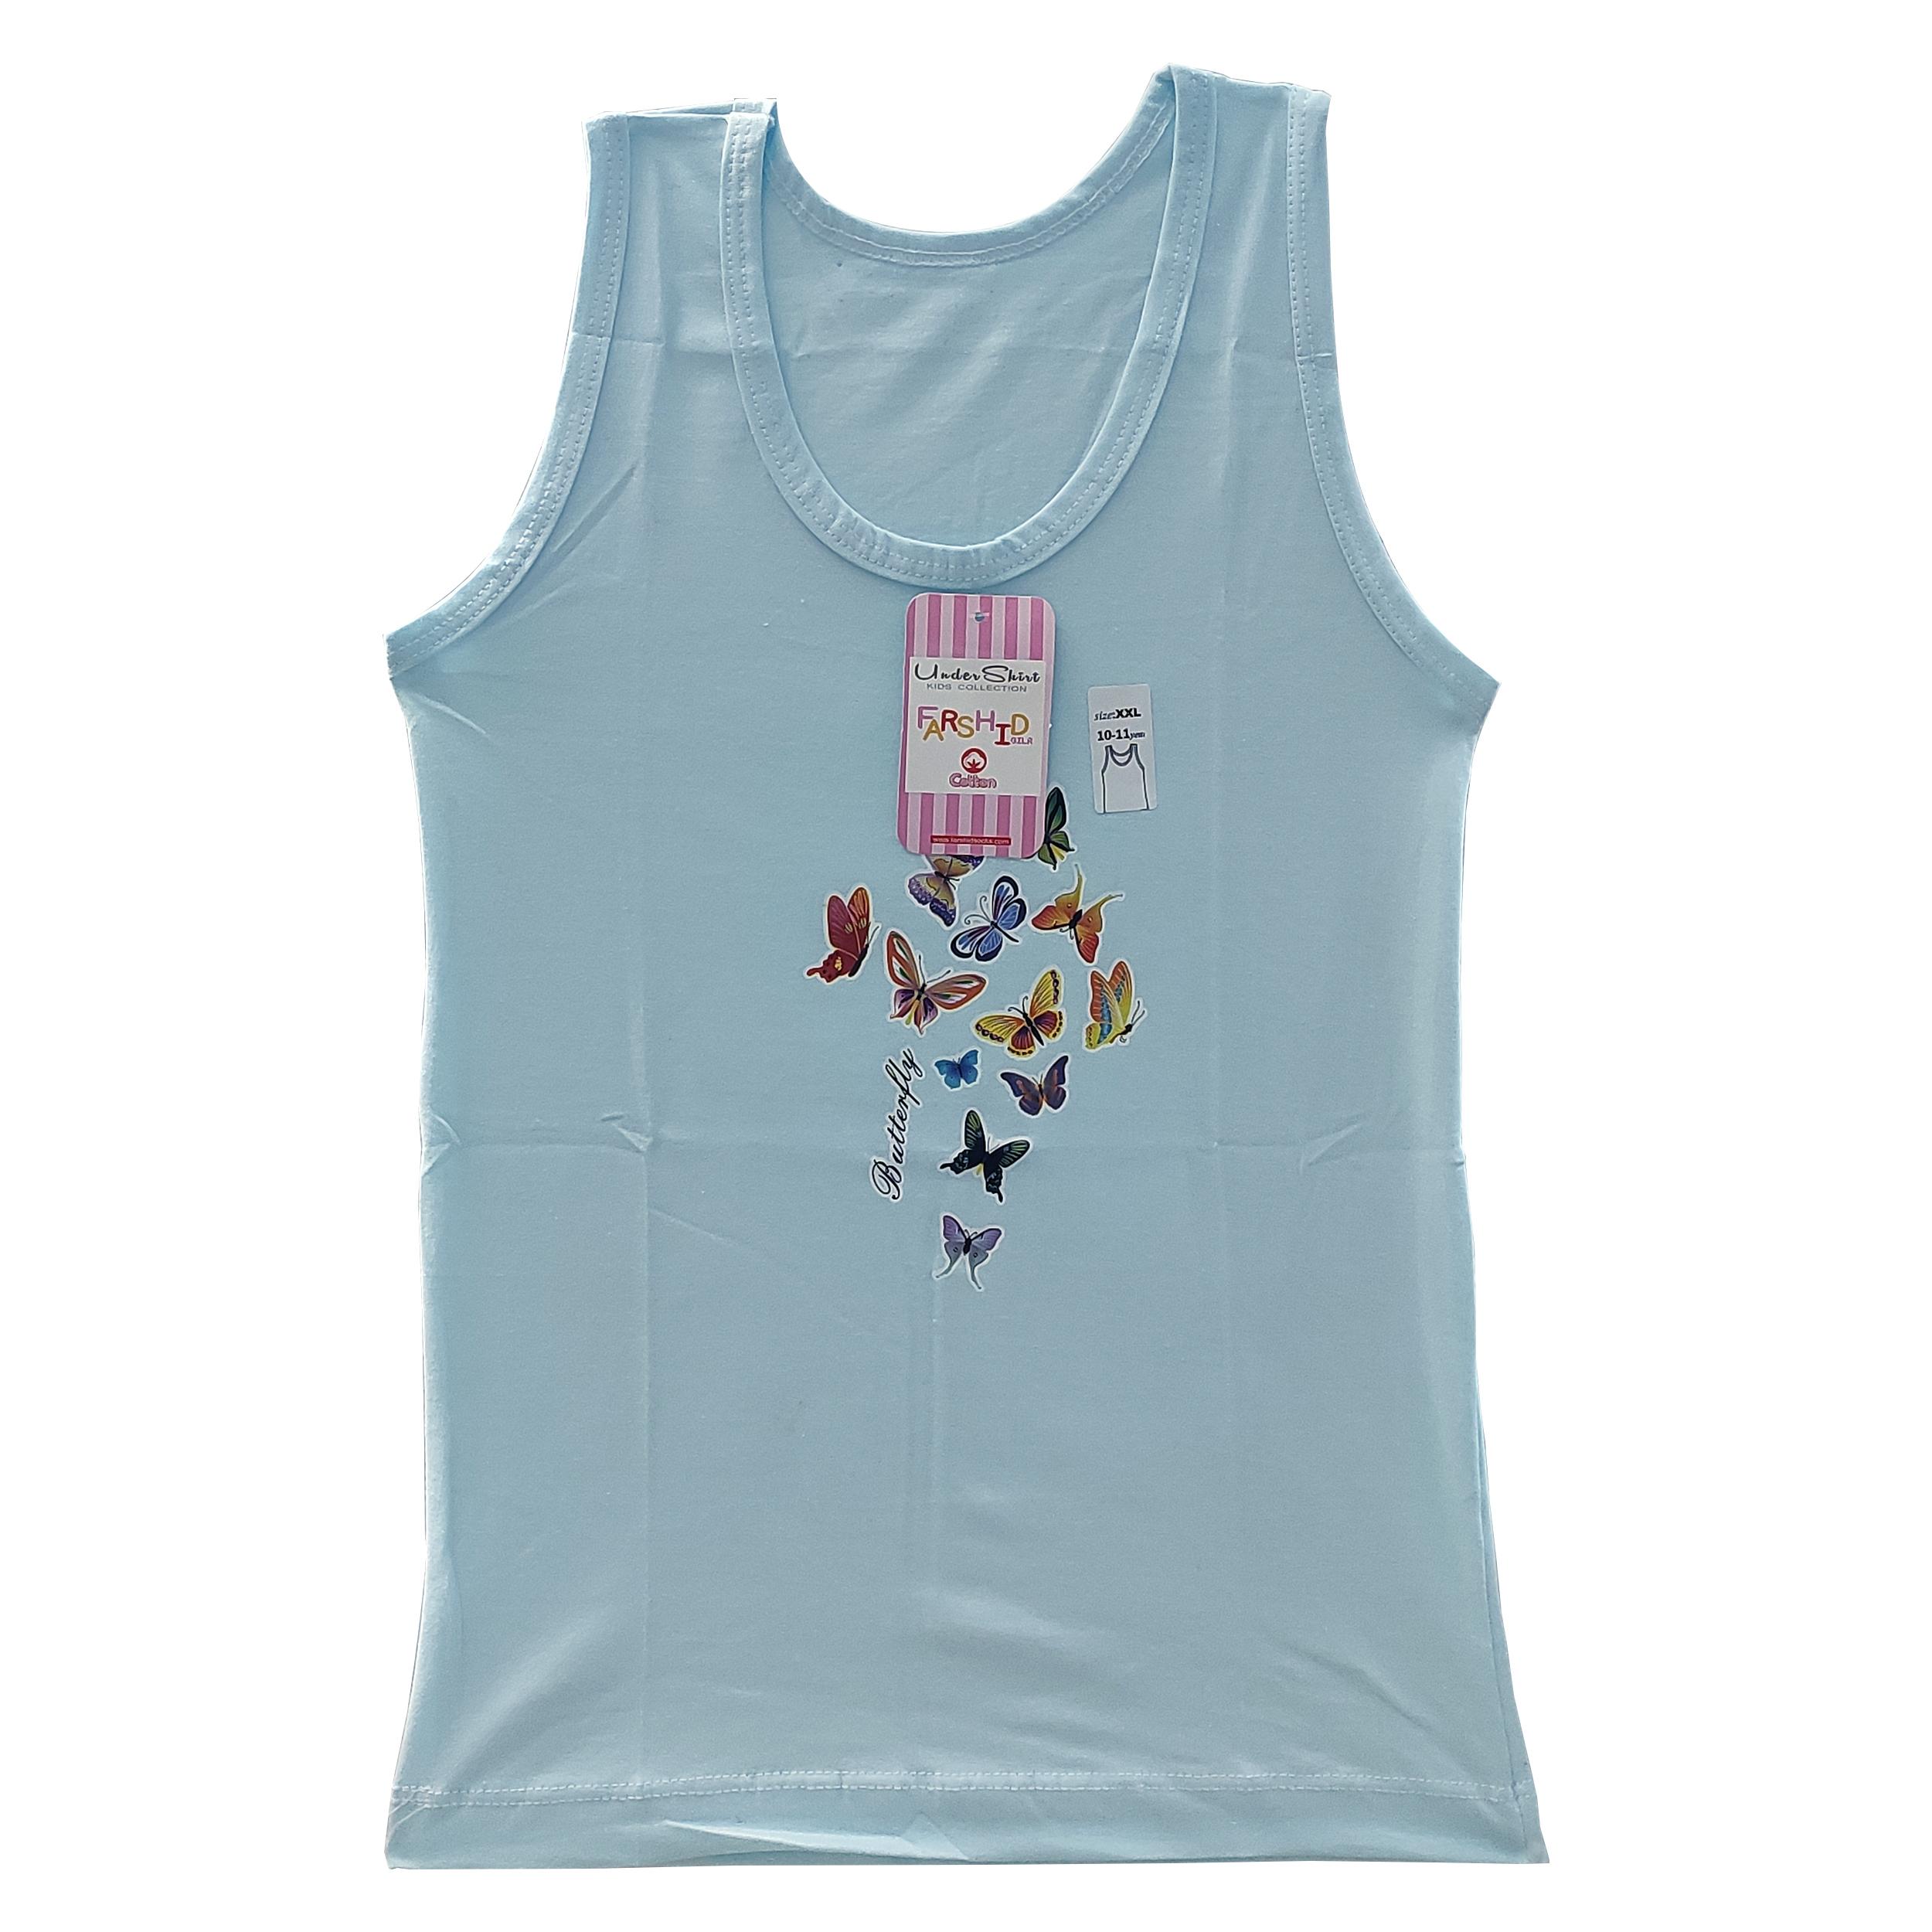 تاپ دخترانه فرشید طرح پروانه کد 30537 رنگ آبی